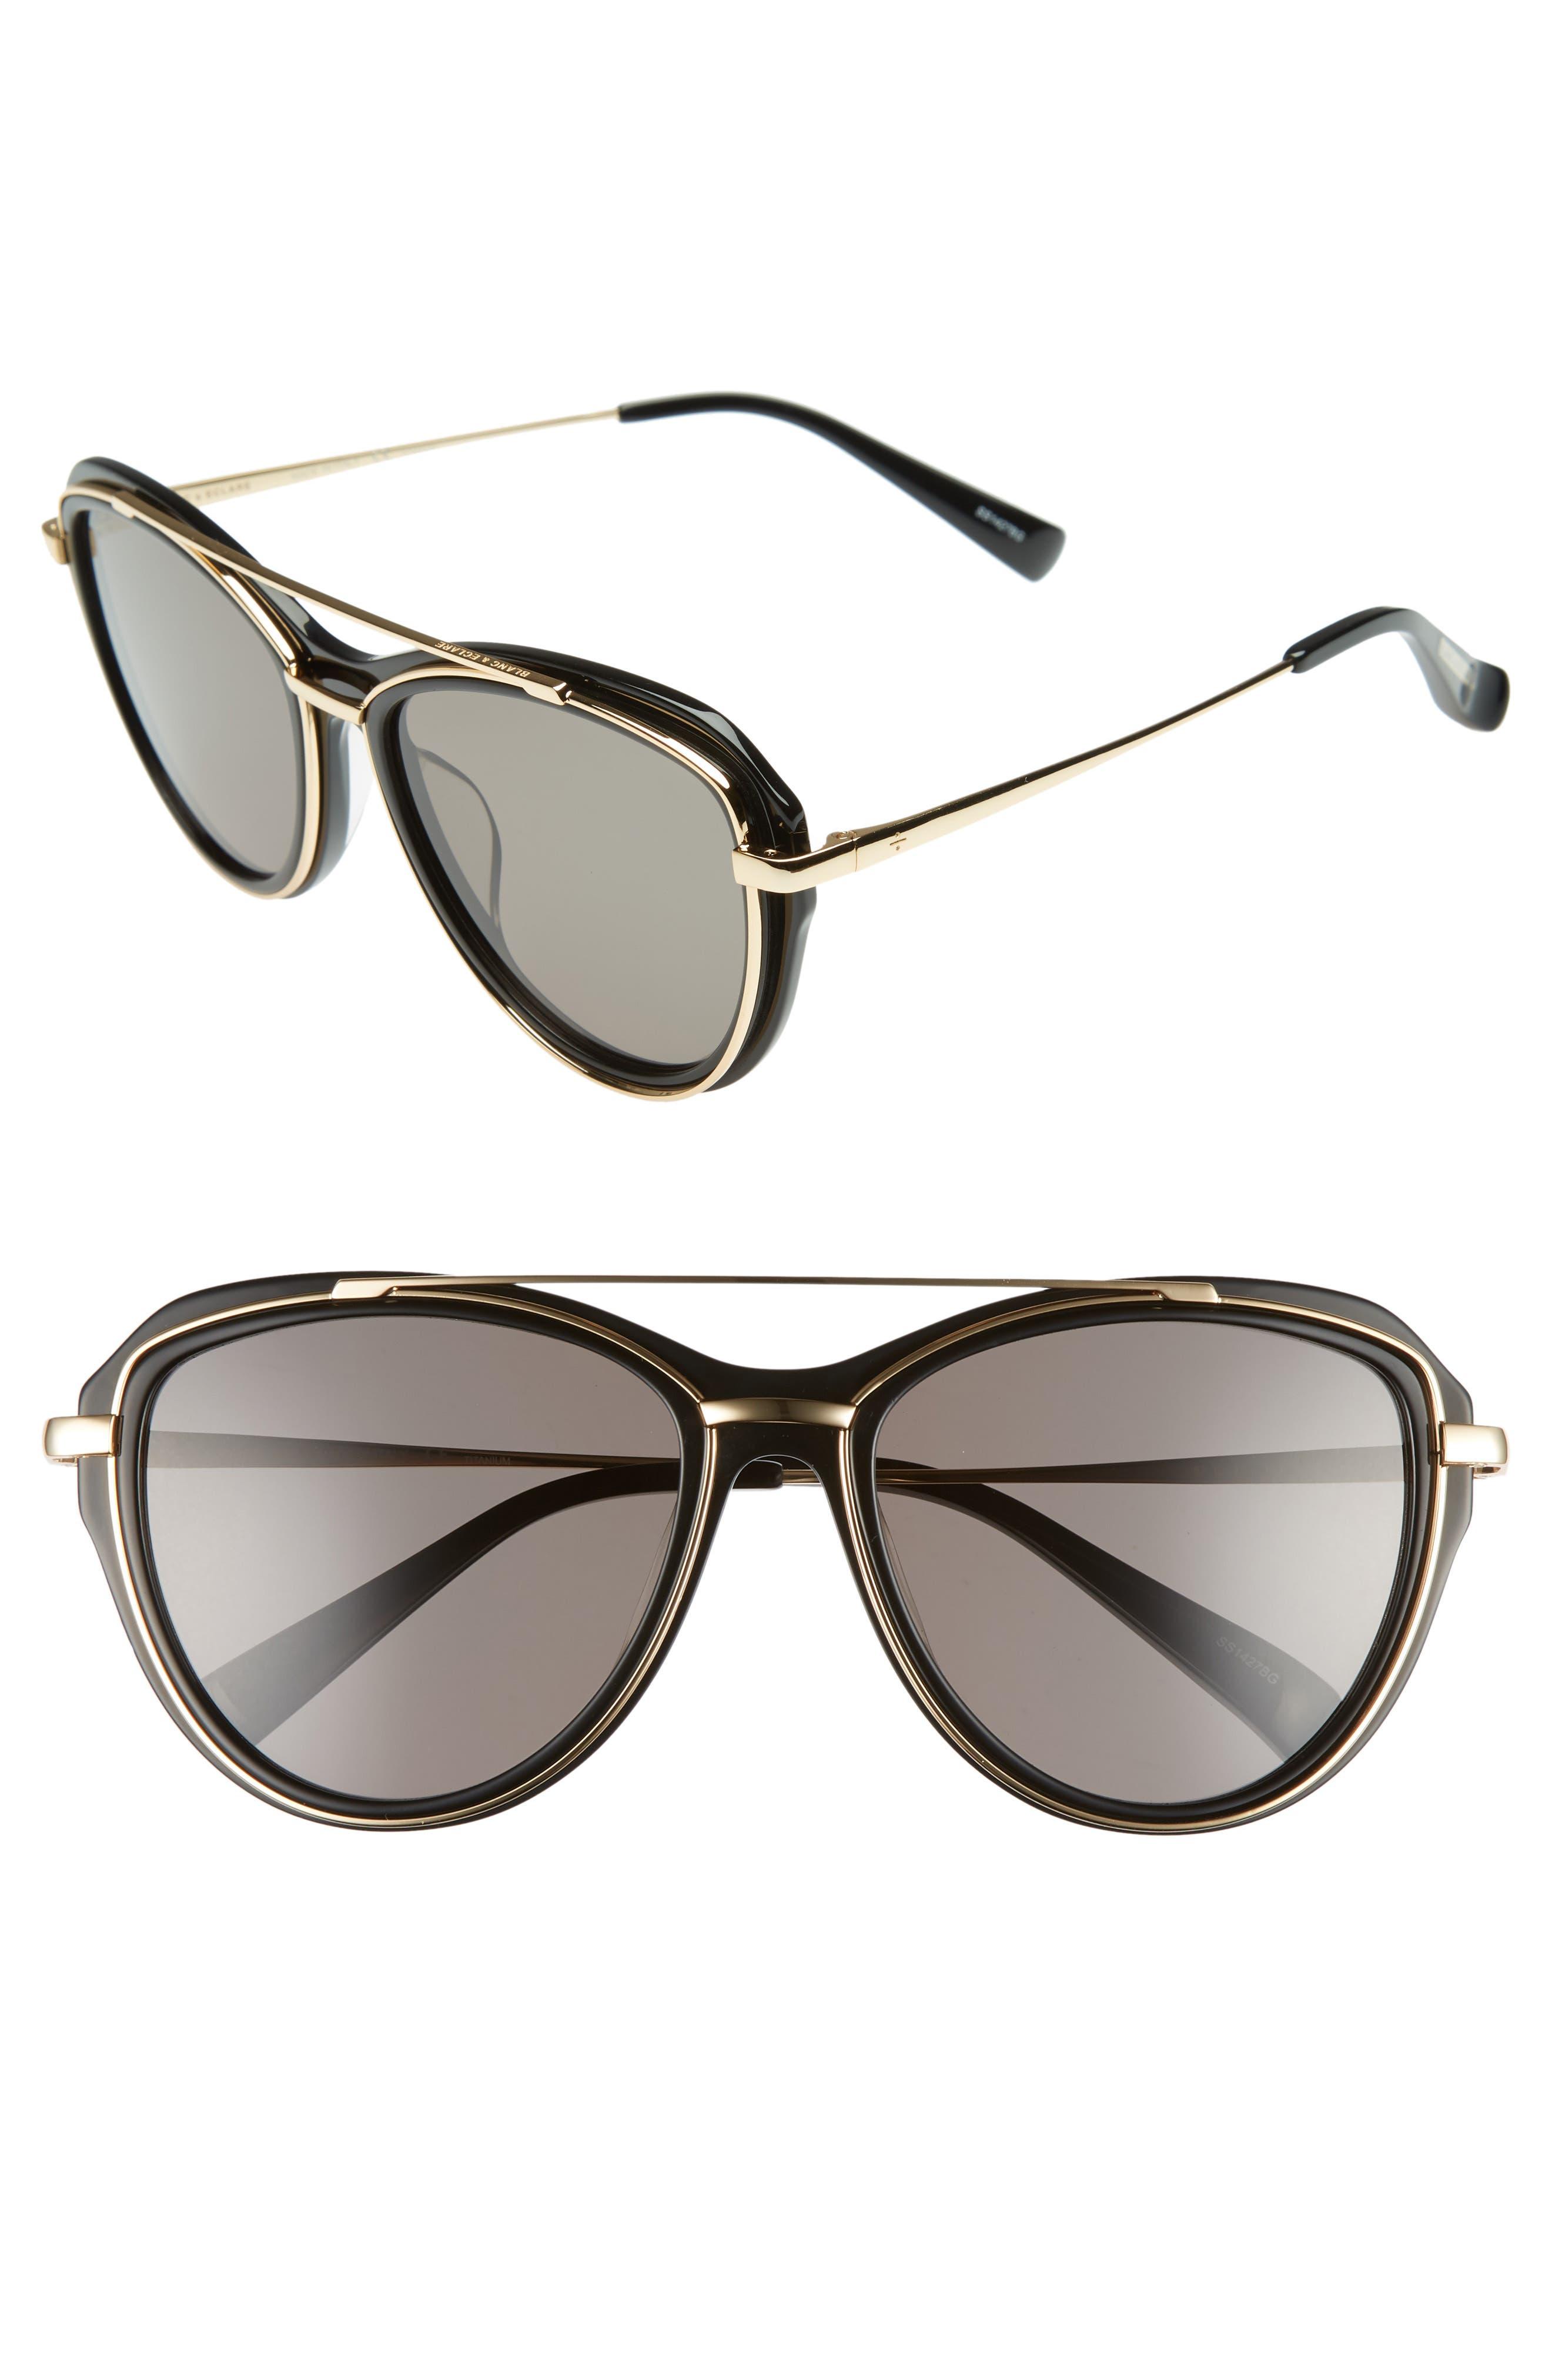 BLANC & ECLARE Marrakesh 57mm Aviator Sunglasses,                             Main thumbnail 1, color,                             Black/ Gold/ Smog Grey